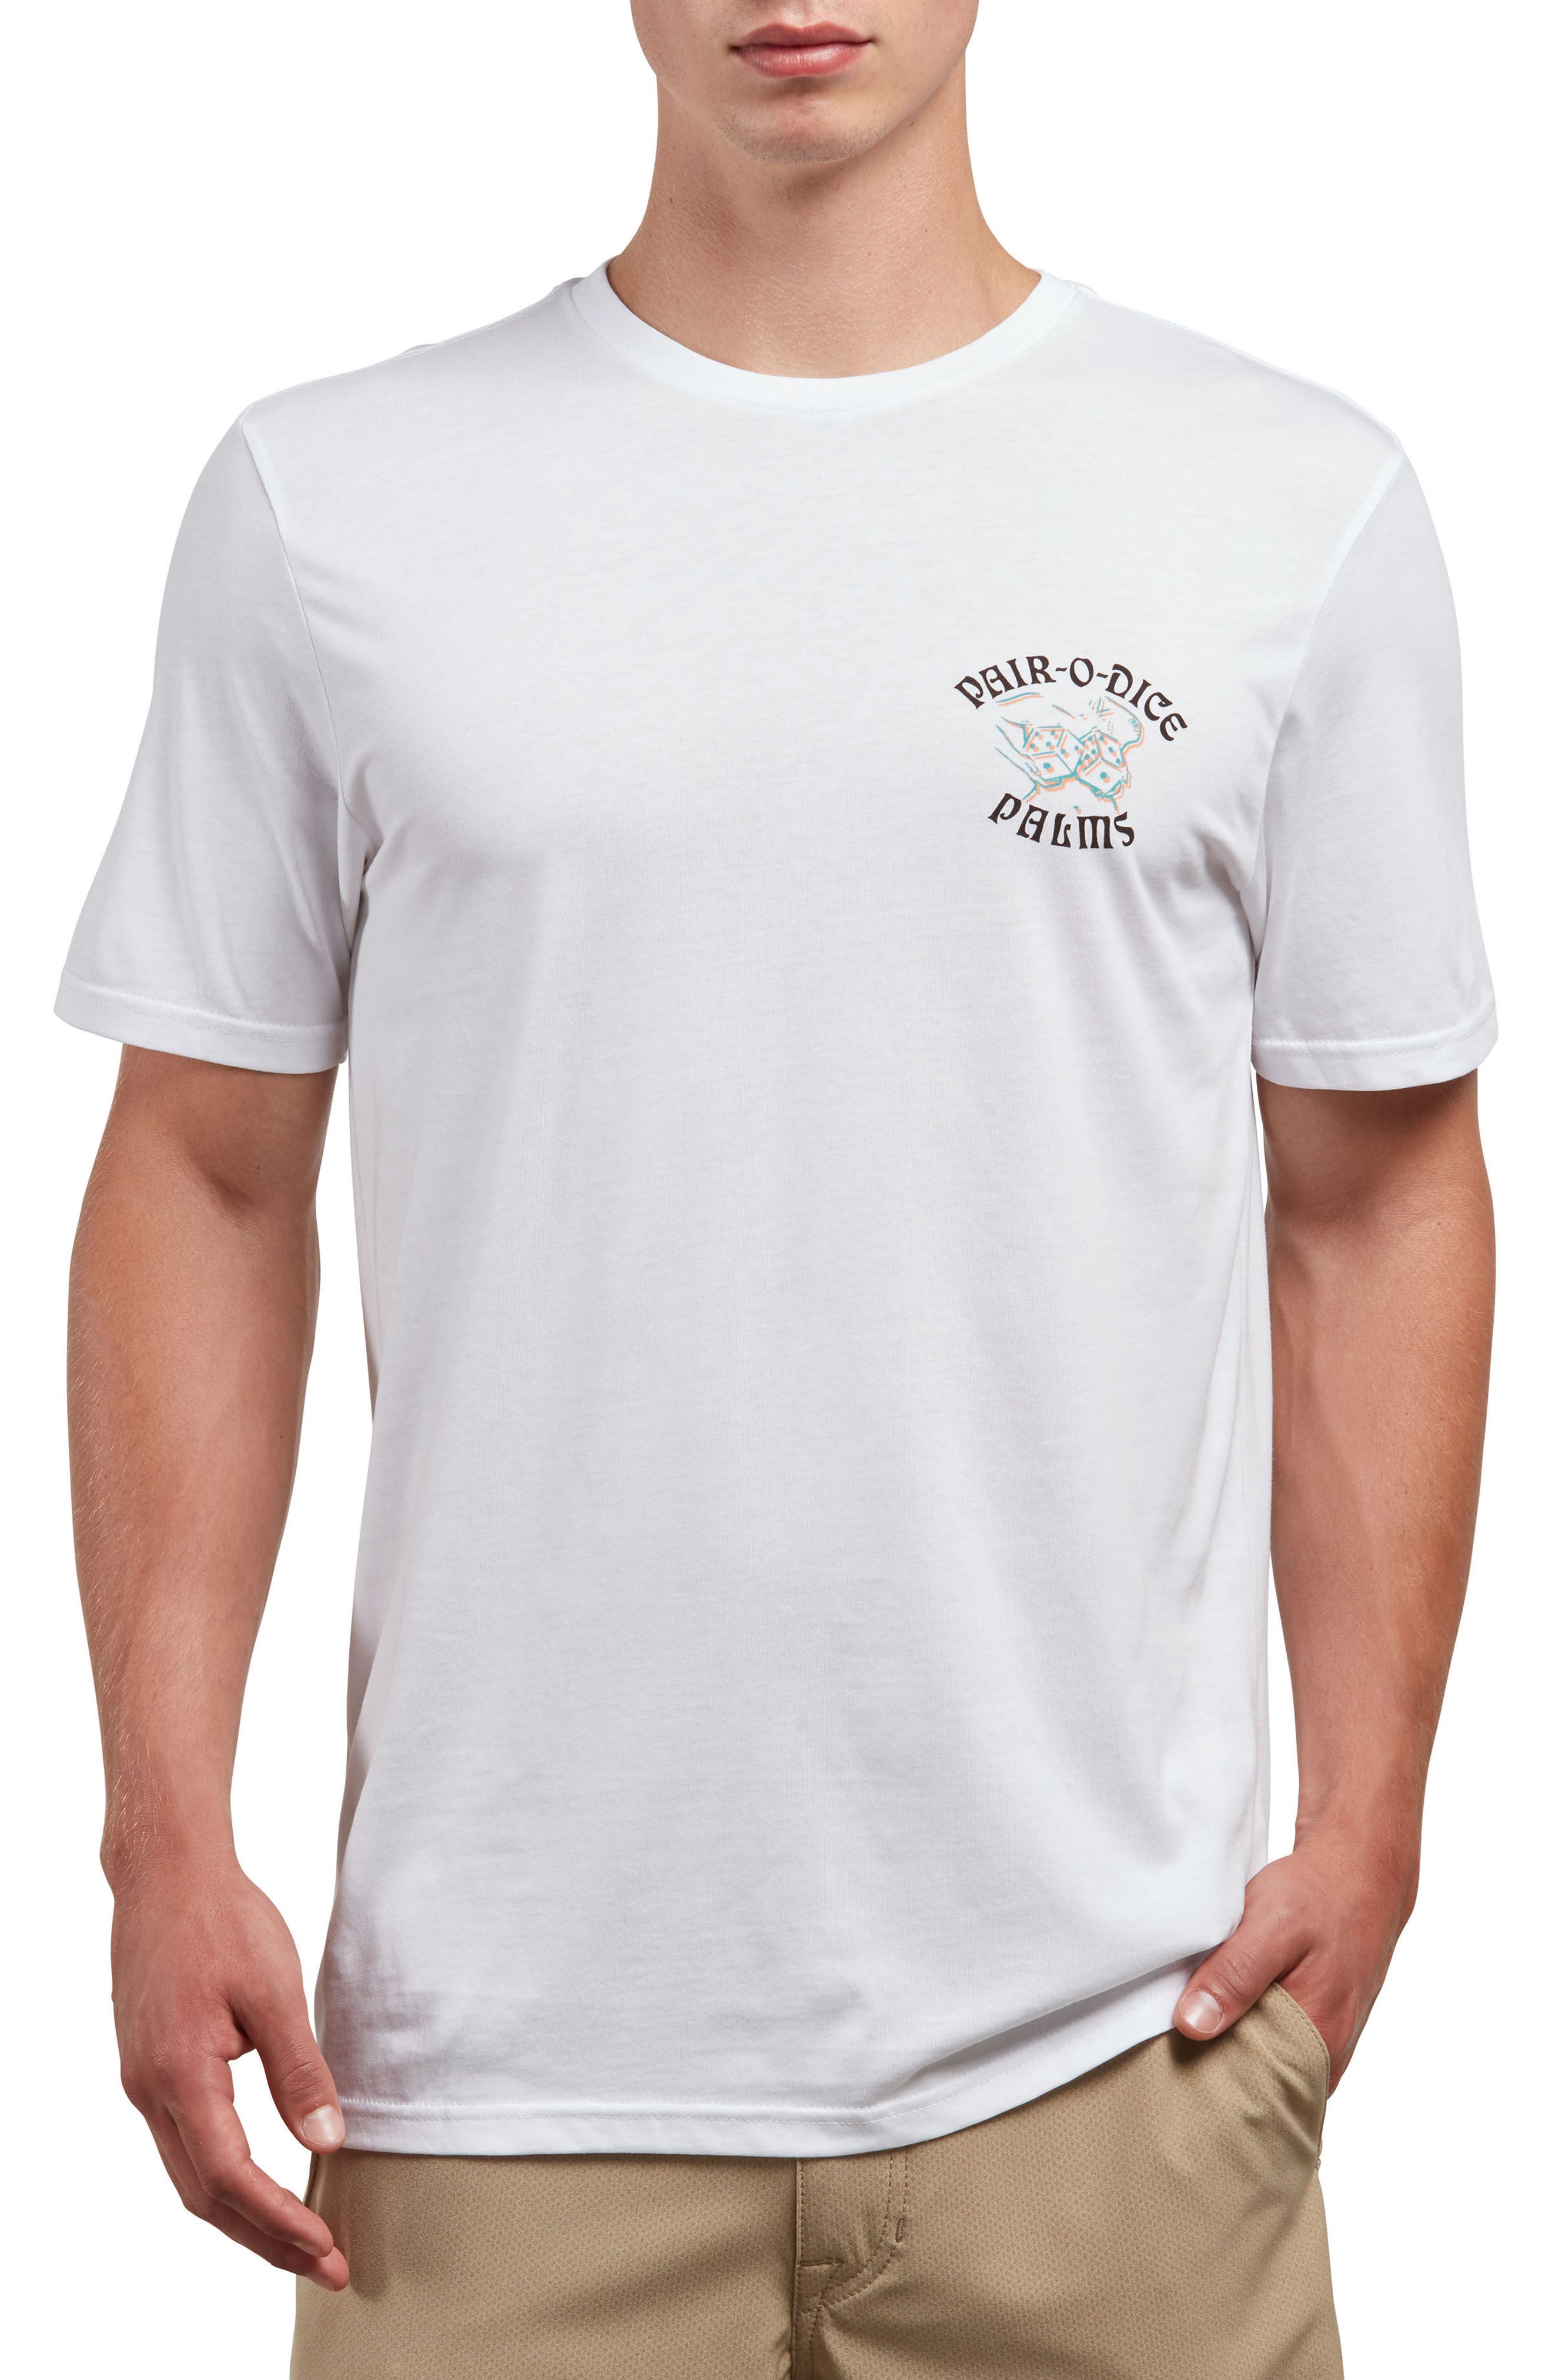 Pair-O-Dice T-Shirt,                             Main thumbnail 1, color,                             White